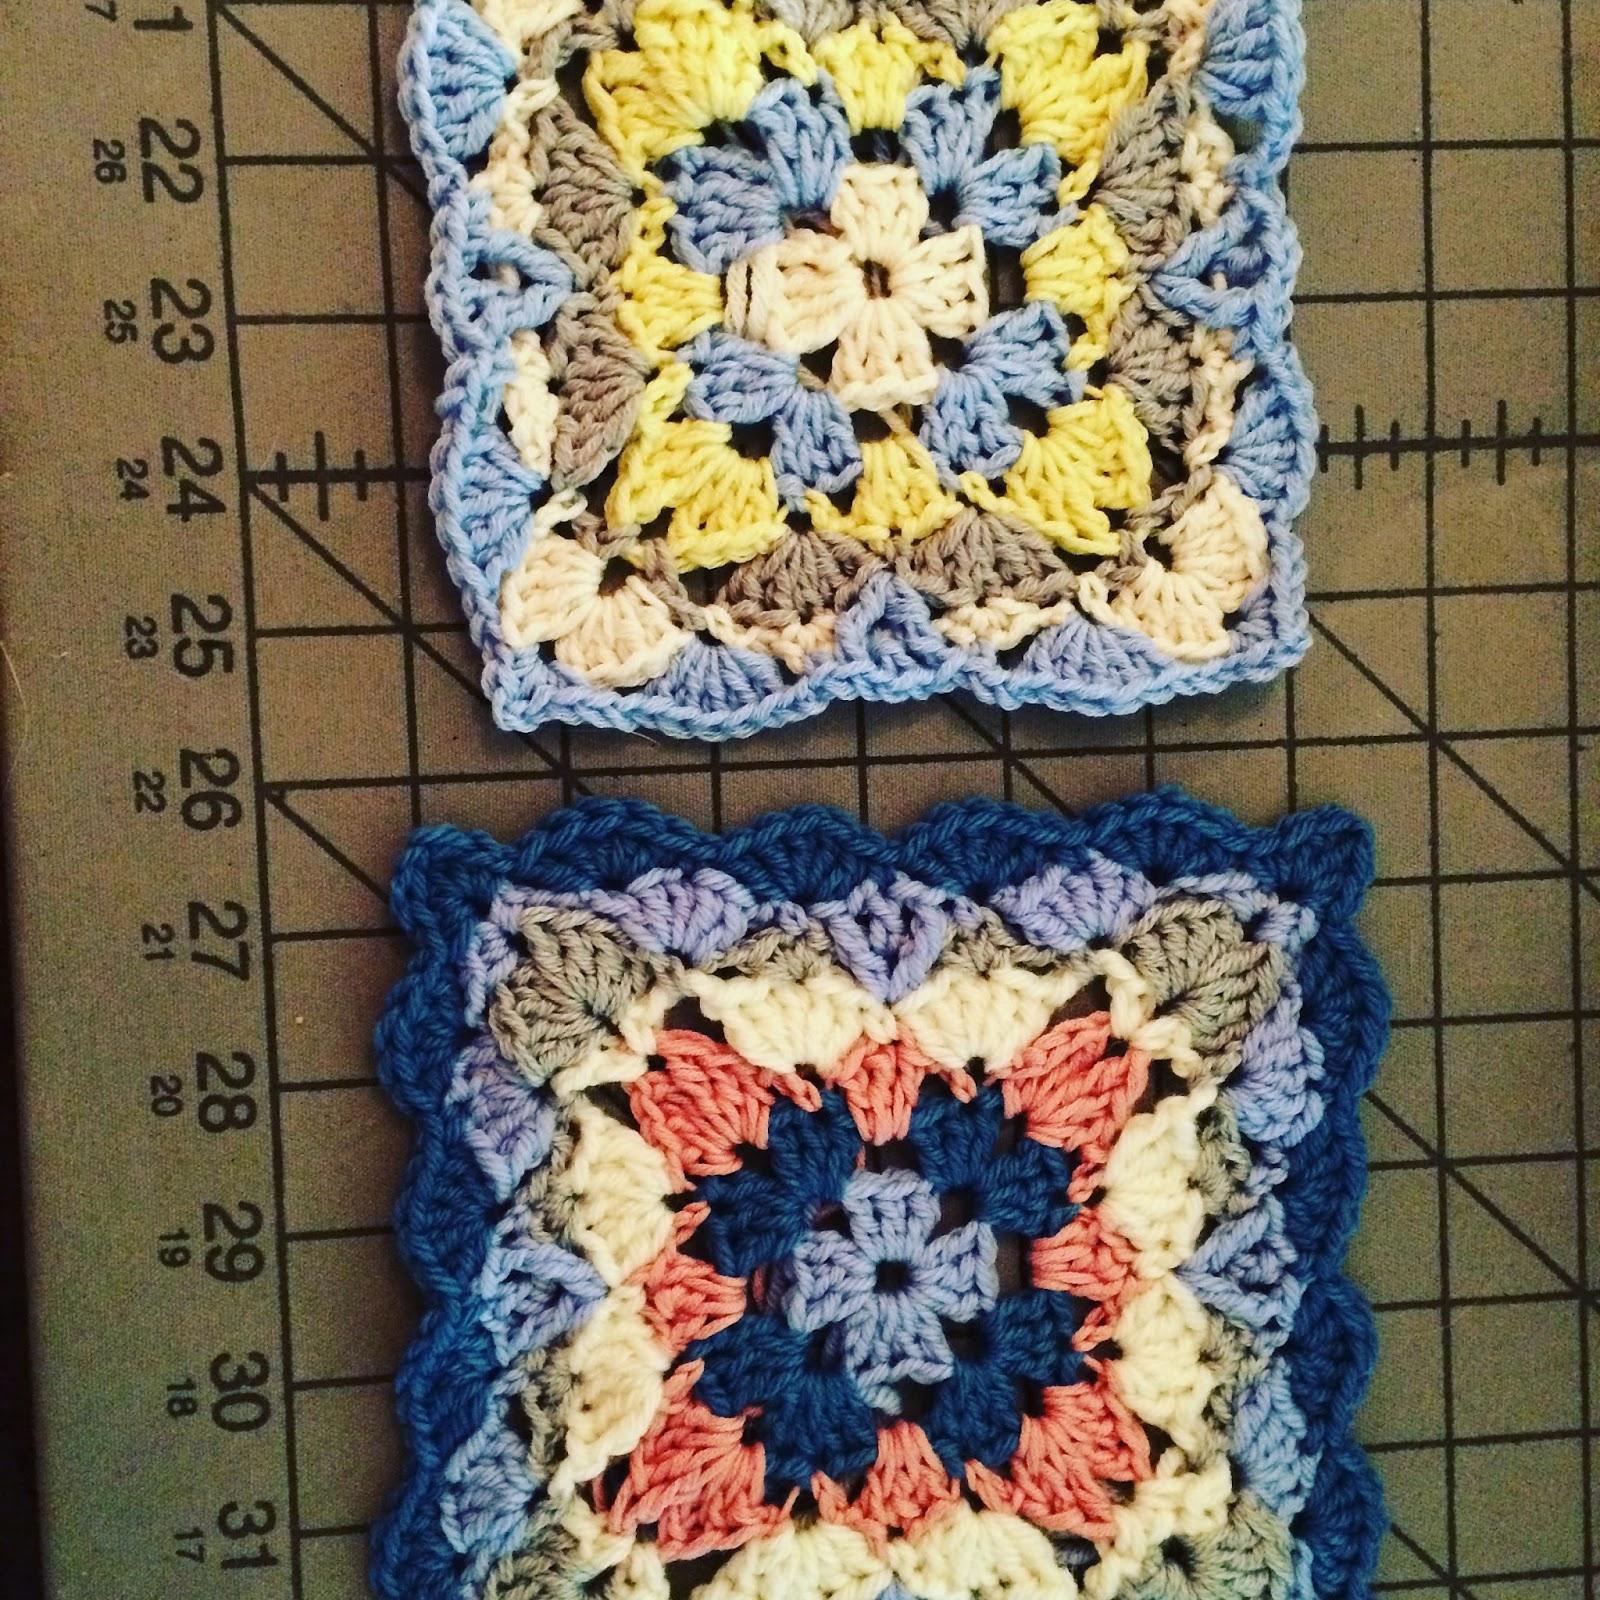 Crochet tunic for a baby by April Garwood of Banana Moon Studio